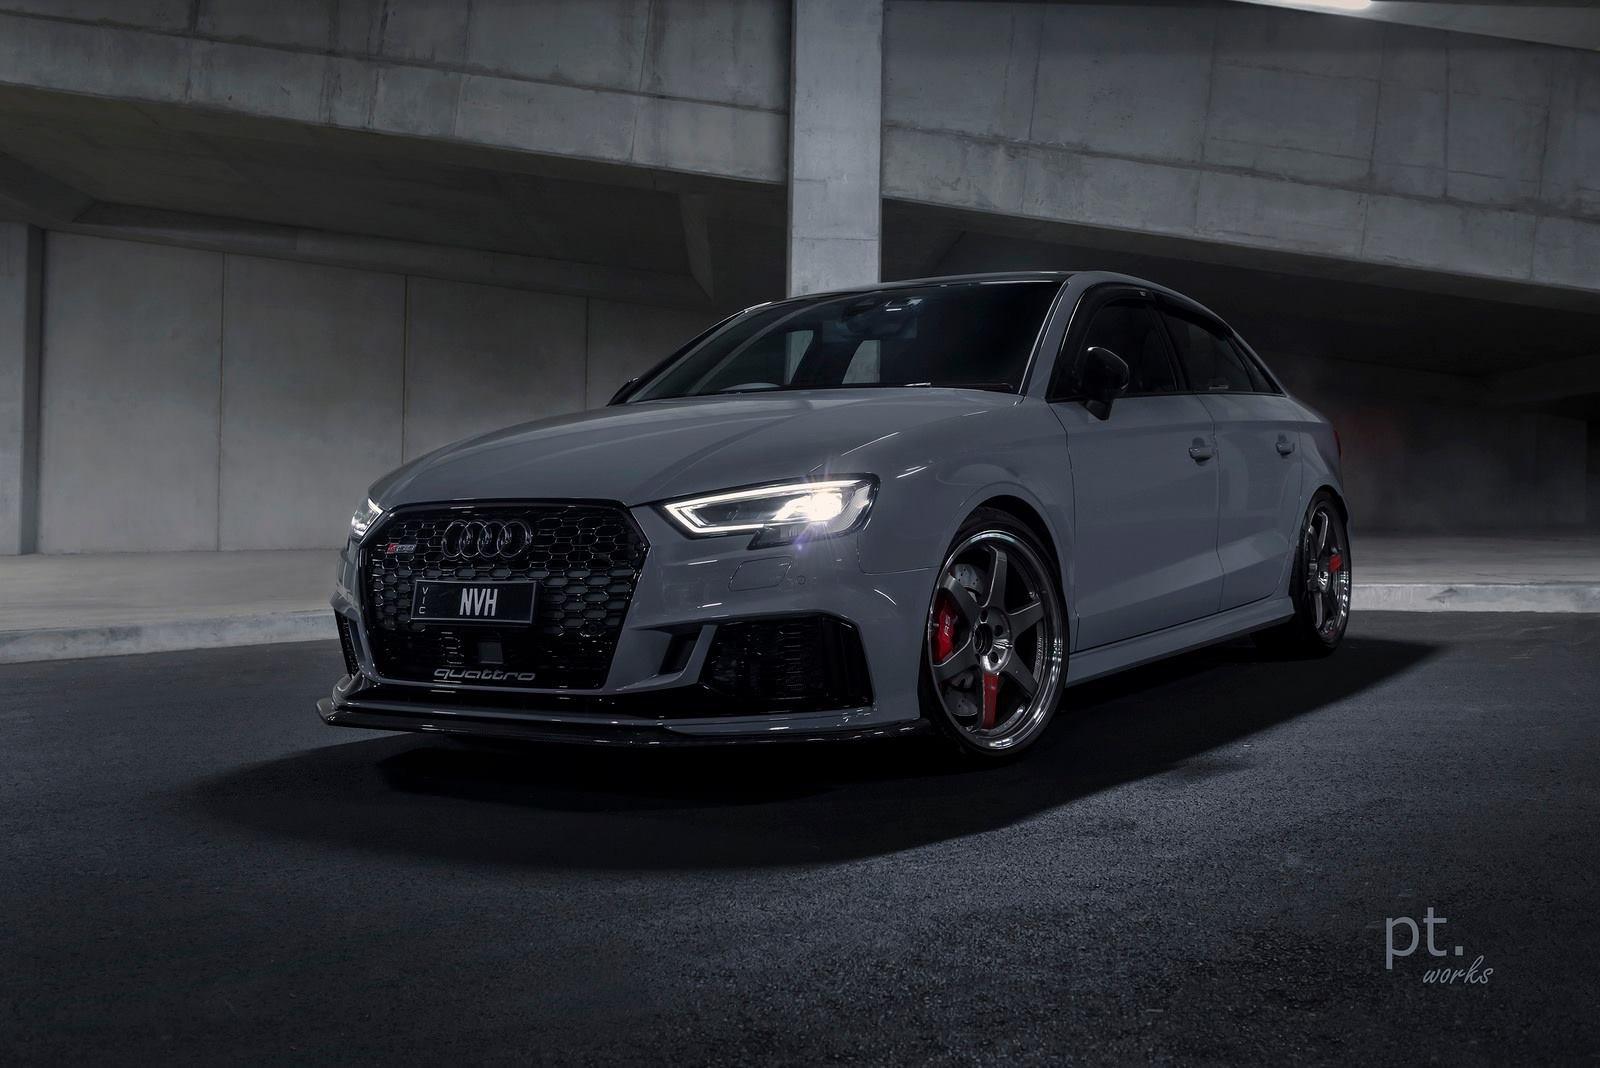 Sharp-looking Audi S3 in Graphite Gray Color — CARiD.com Gallery on audi moss green, audi bronze, audi chrome, audi cobalt blue, audi maroon, audi yellow, audi black, audi midnight blue, audi white, audi gold, audi purple,